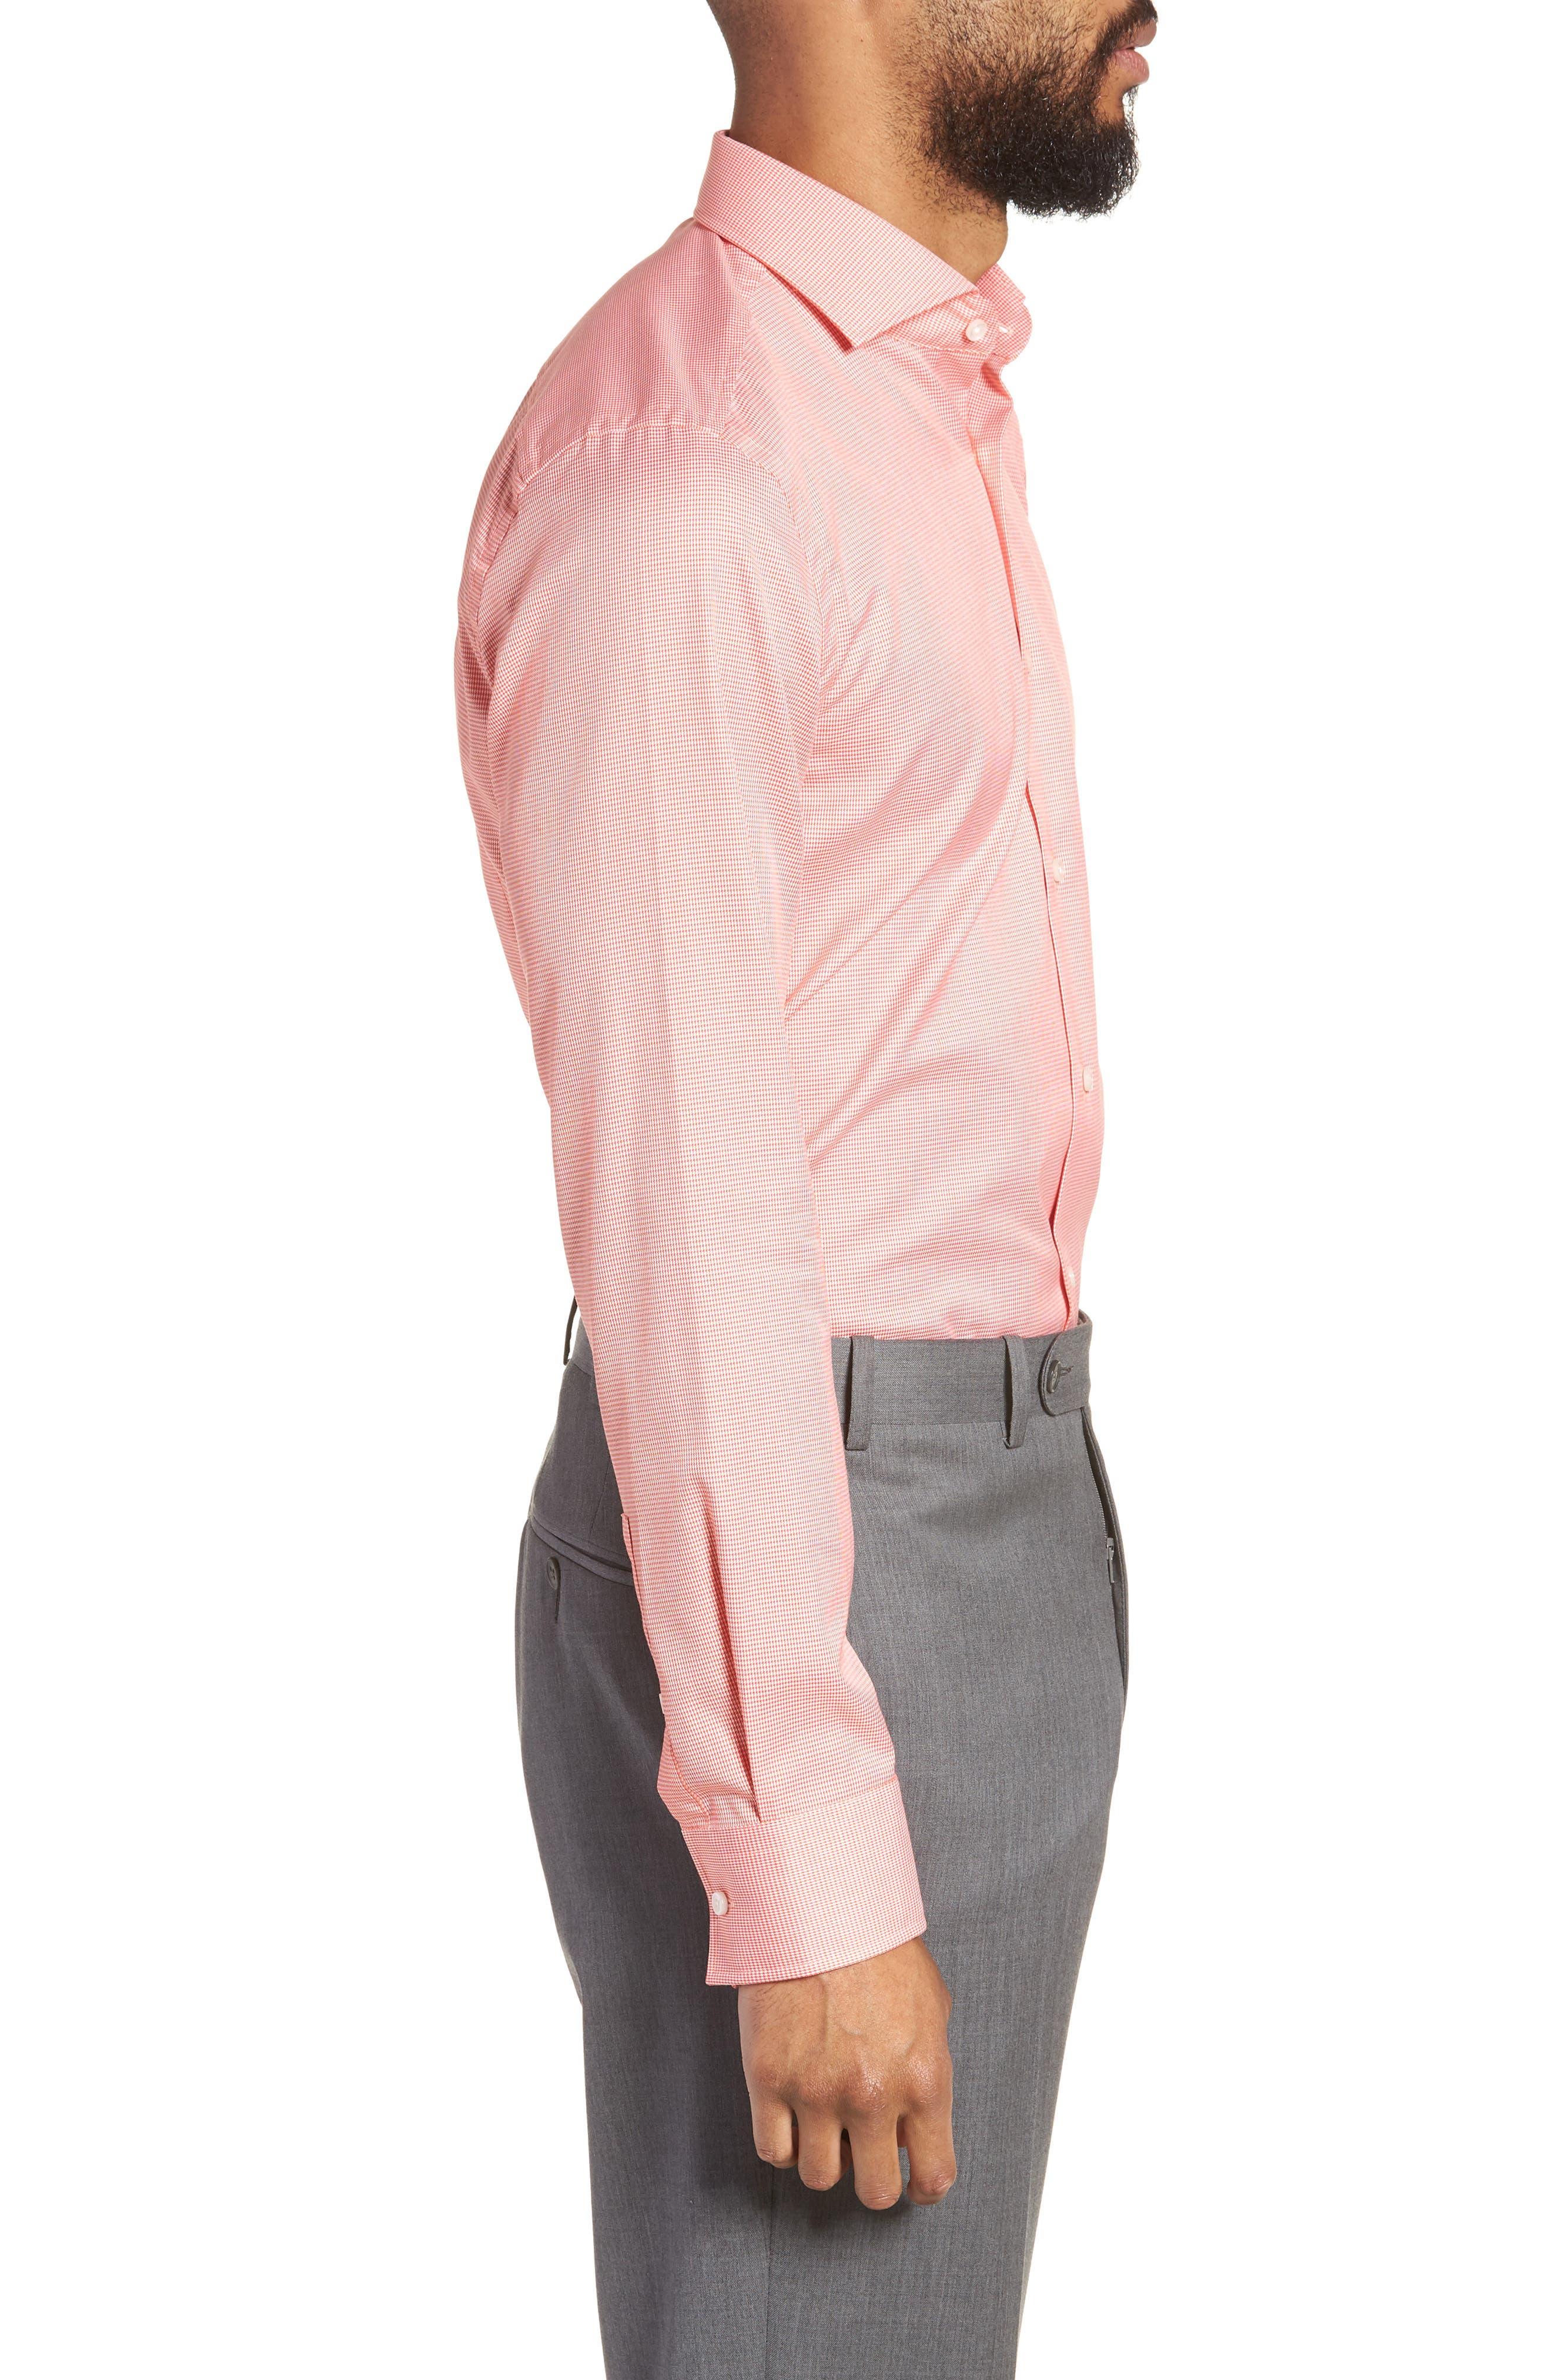 Jason Slim Fit Houndstooth Dress Shirt,                             Alternate thumbnail 4, color,                             813